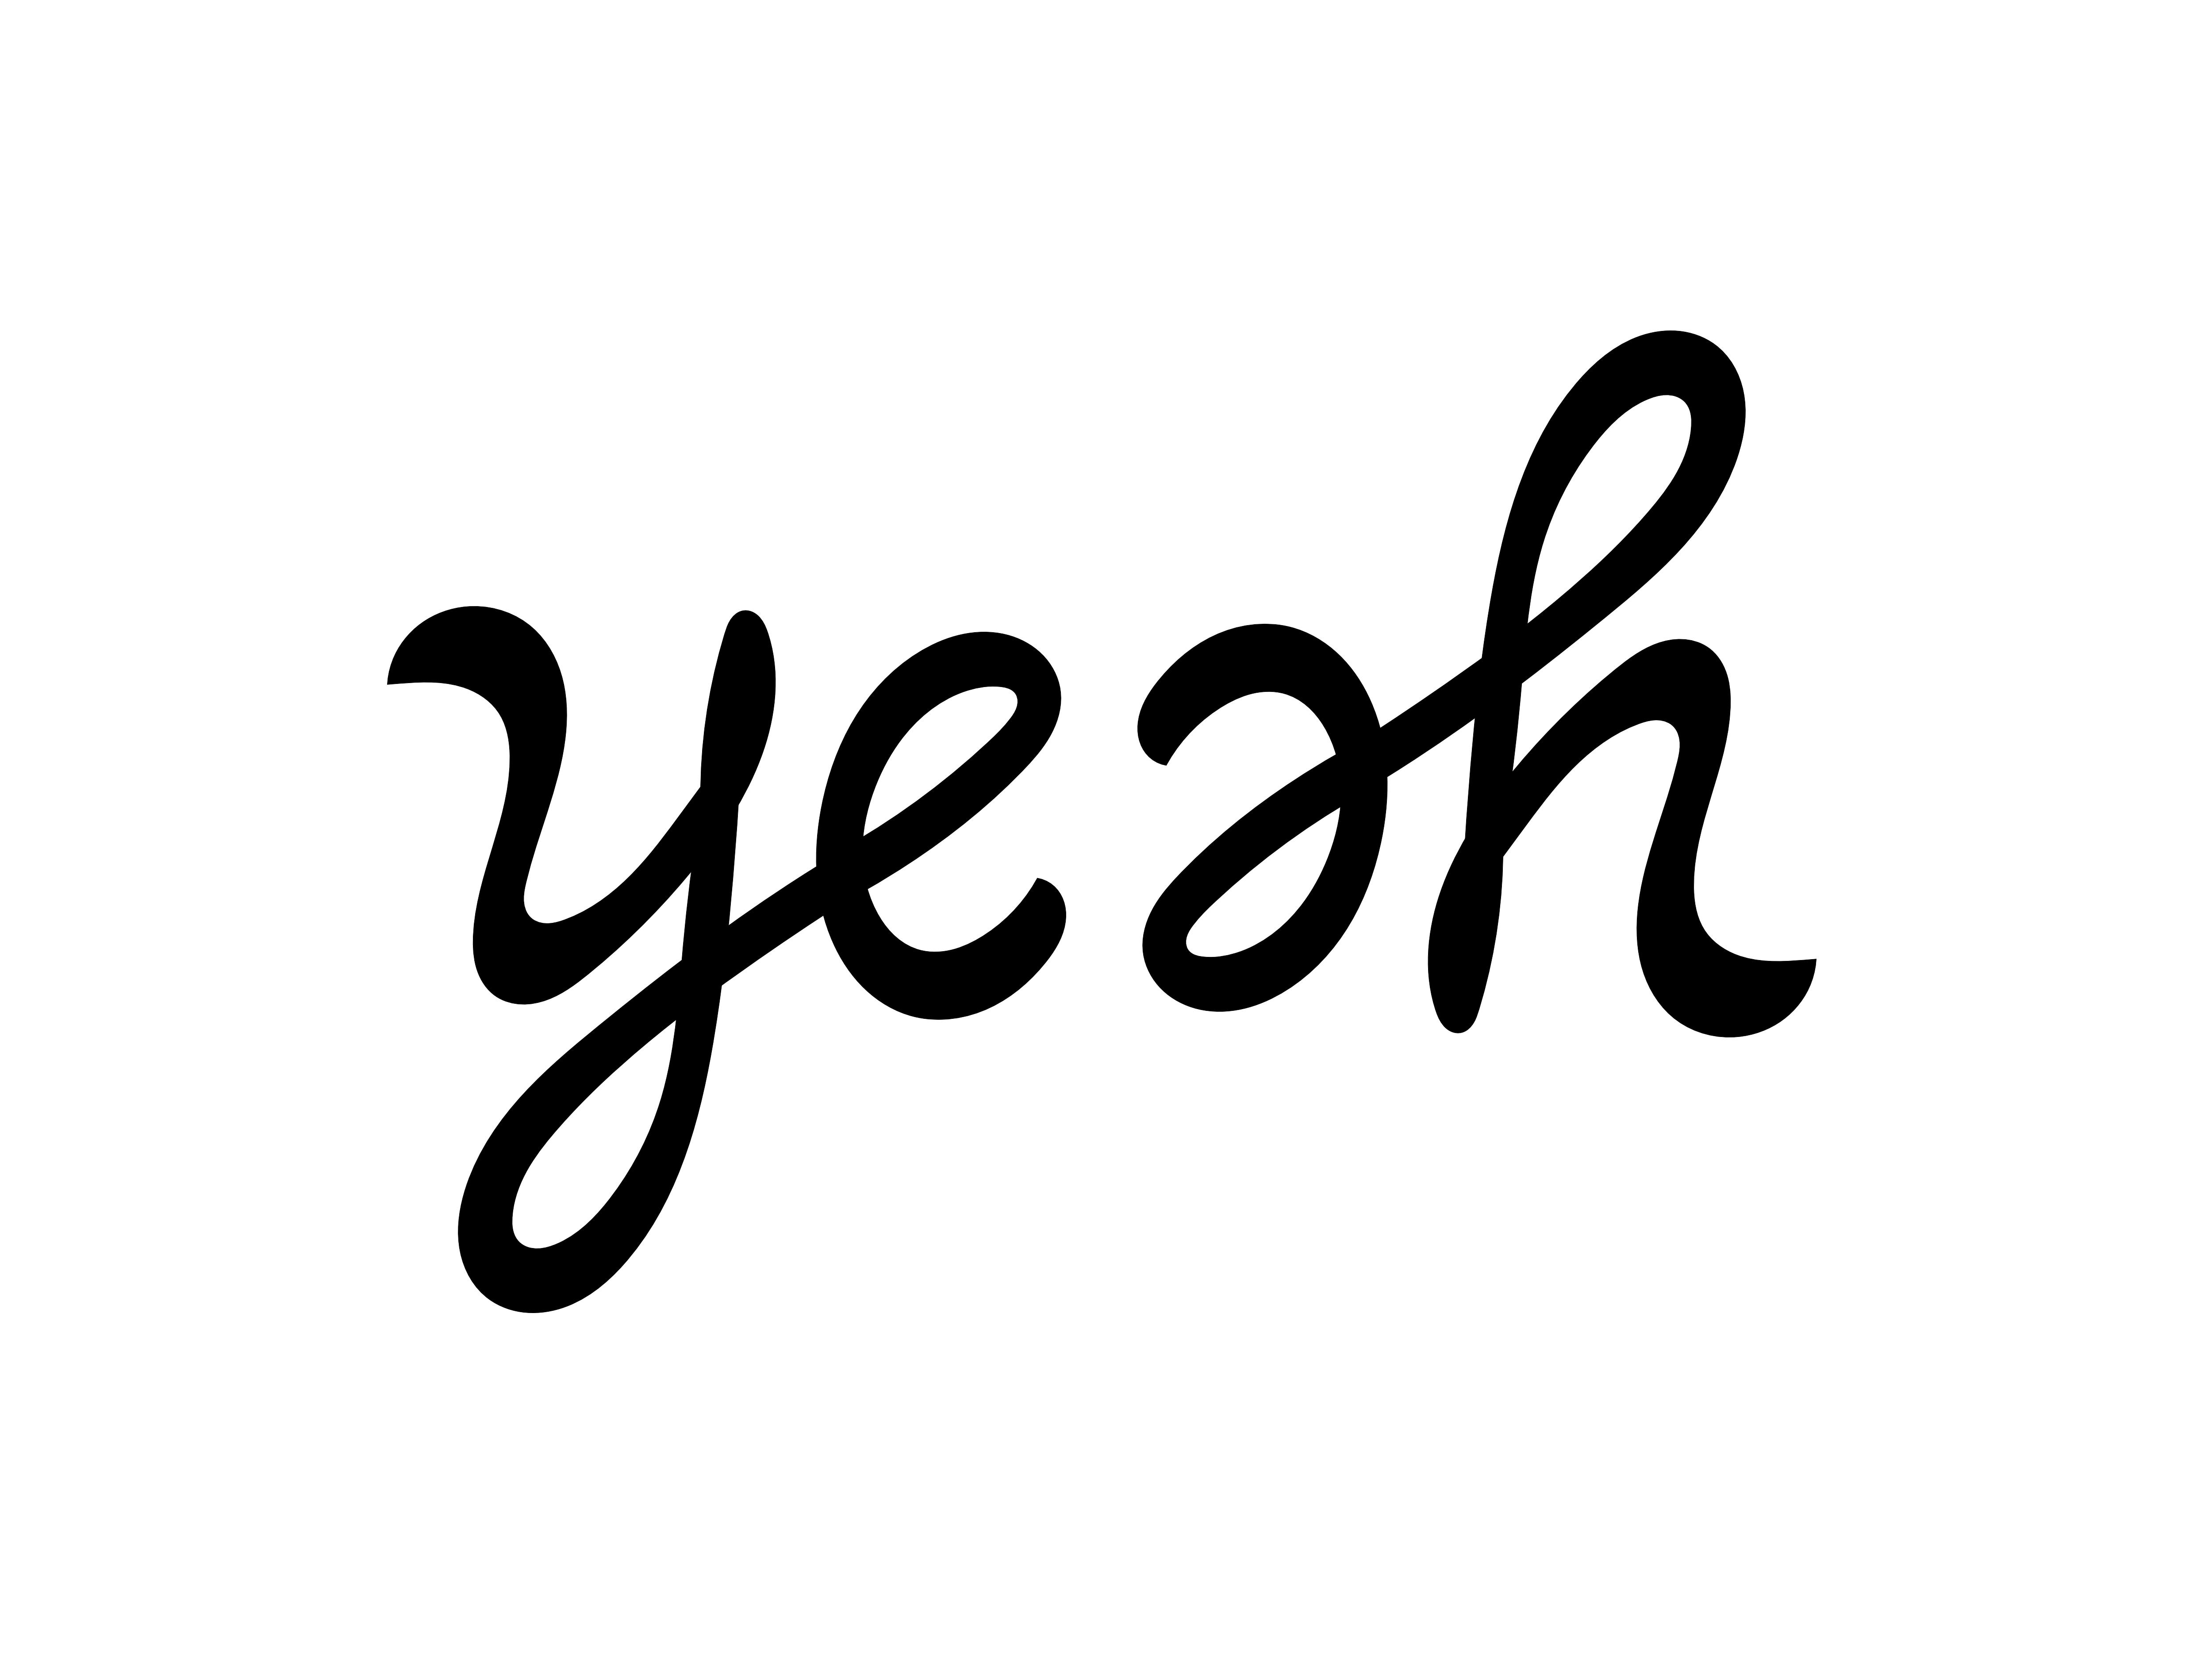 File:Ambigram yeah.png.